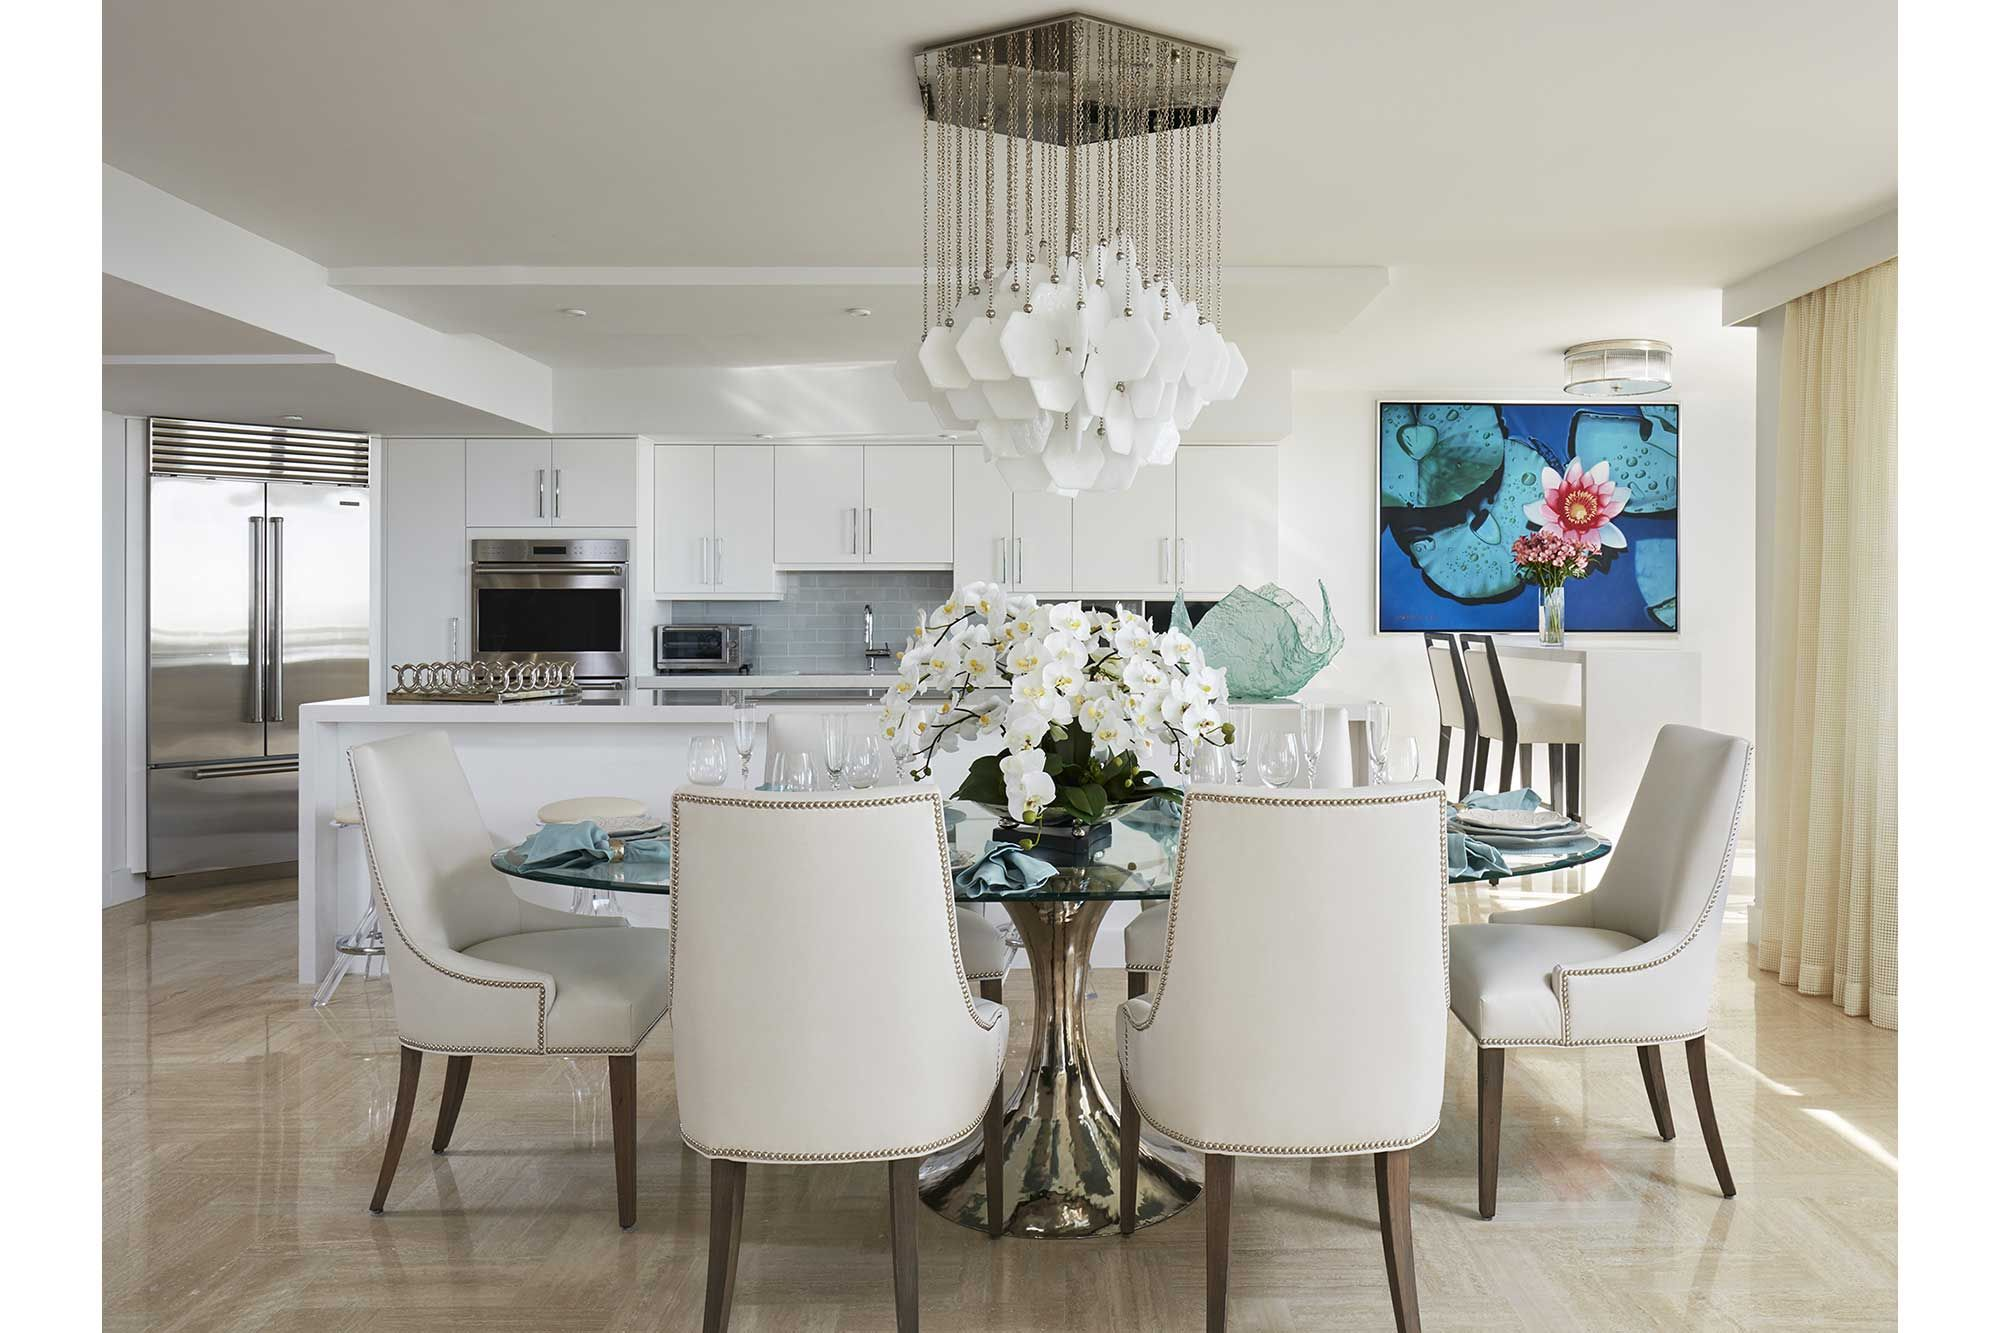 Grand White Kitchen | house ideas | Pinterest | Palm beach, Beach ...